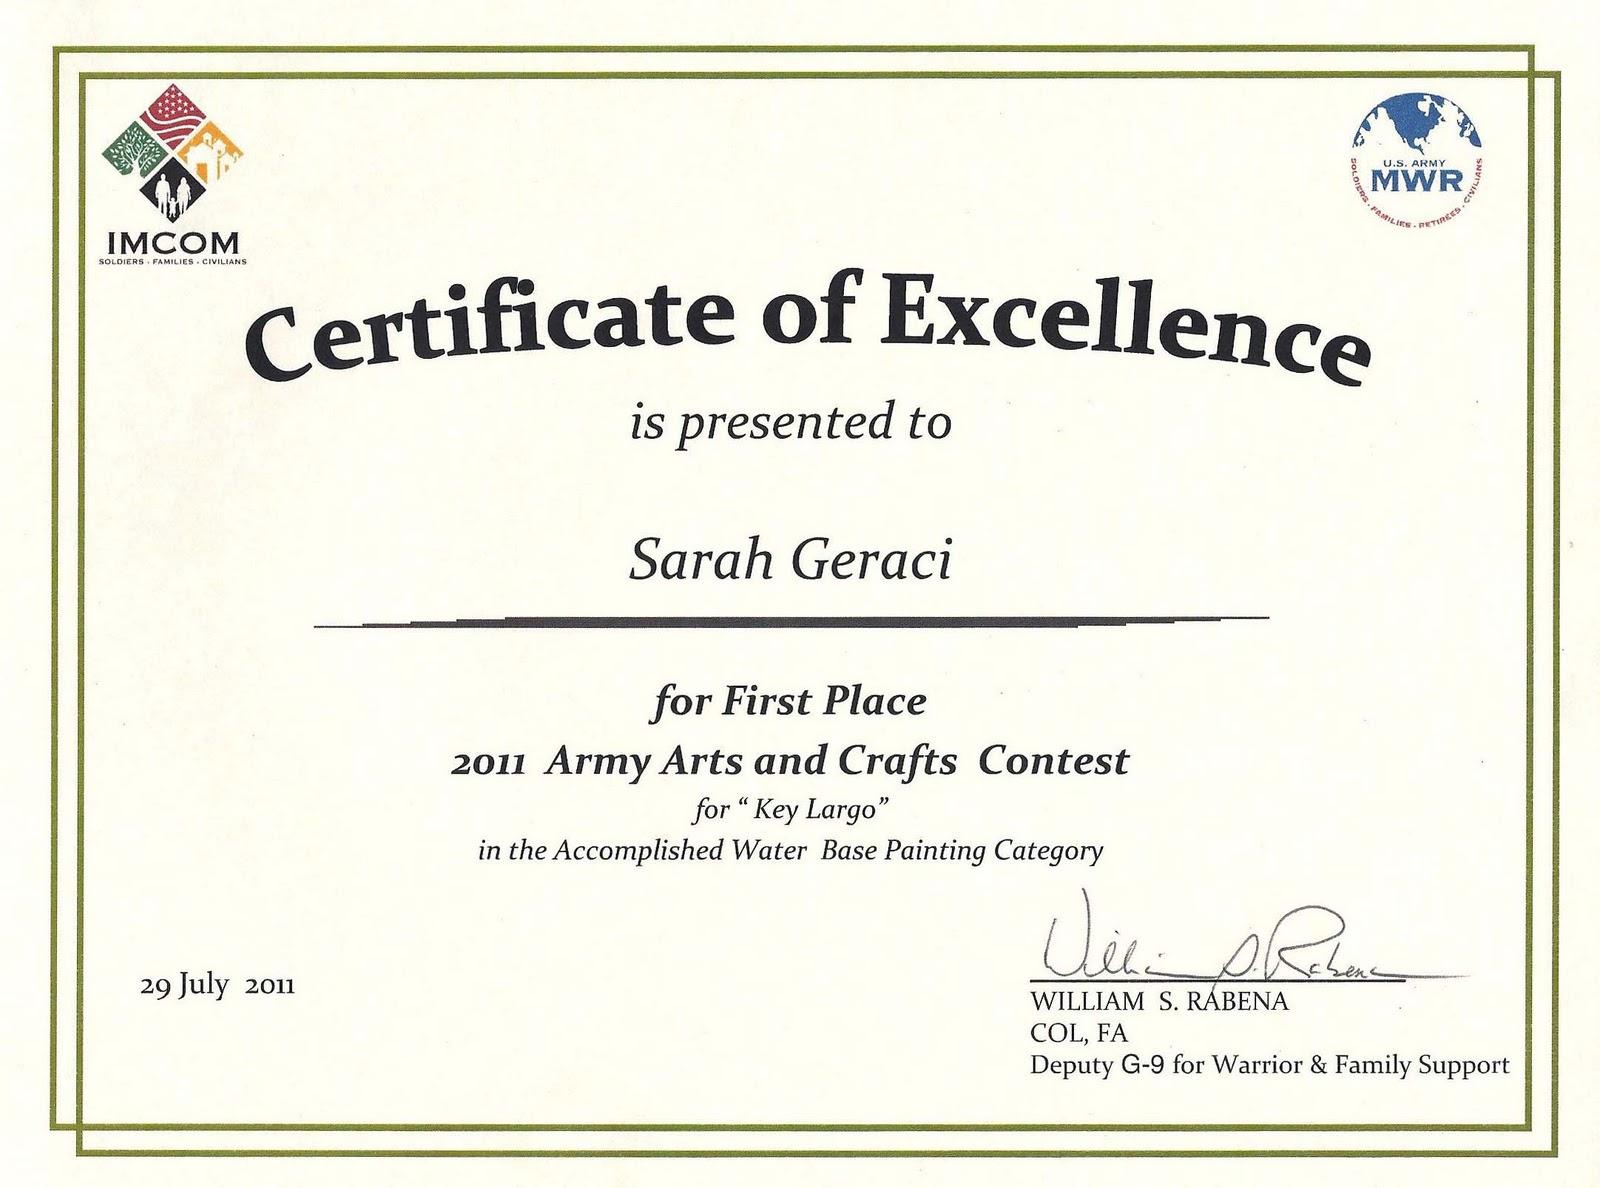 Wonderful Art Award Certificate Template Art%2BAward Art Award Certificate Template  First Place Award Template First Place Award Template Intended For First Place Award Template